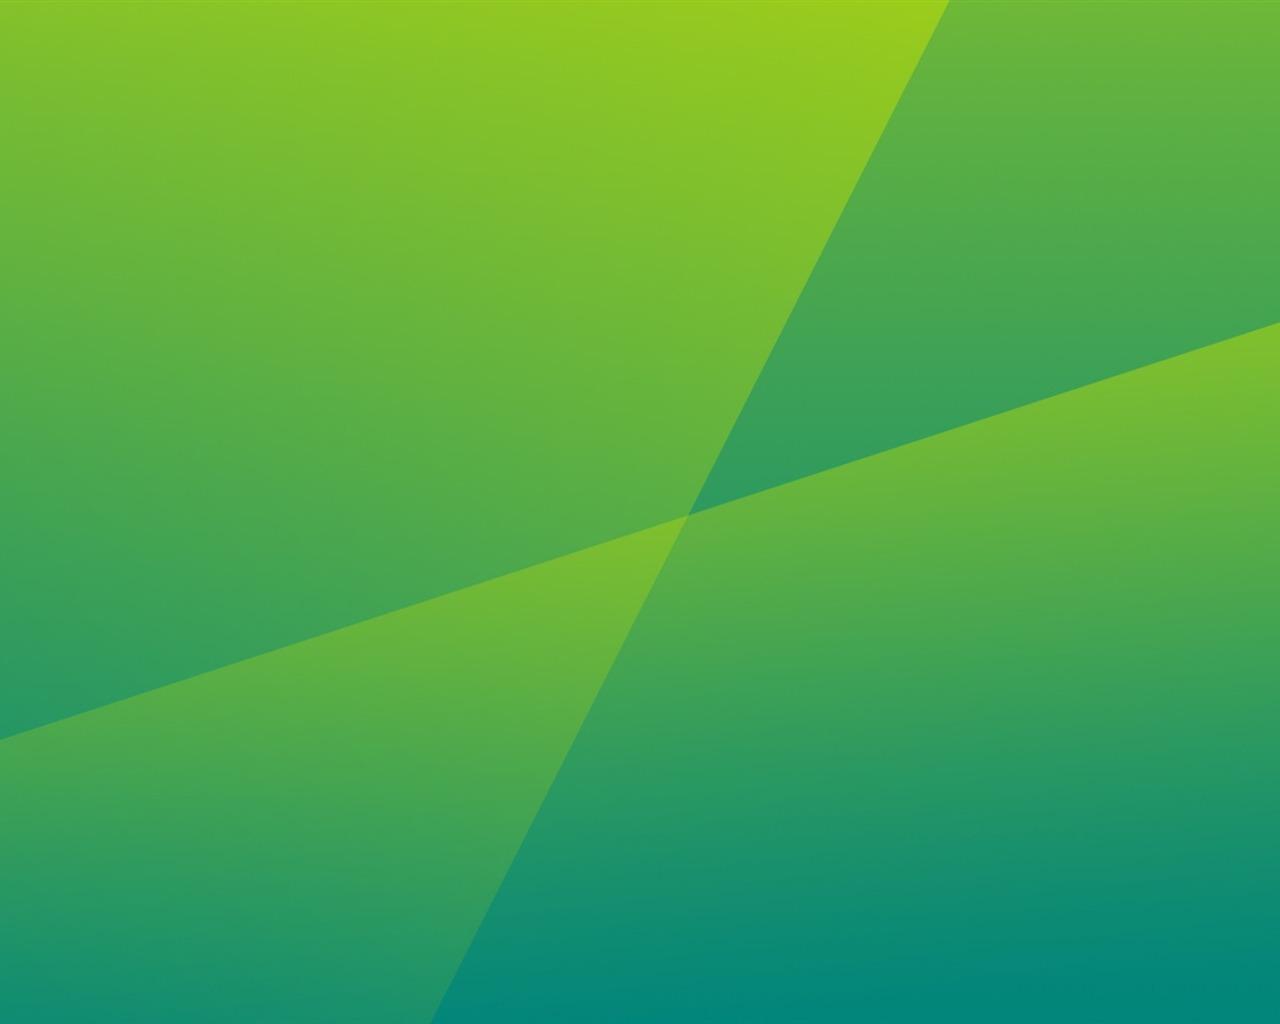 Microsoft silverlight download windows 10